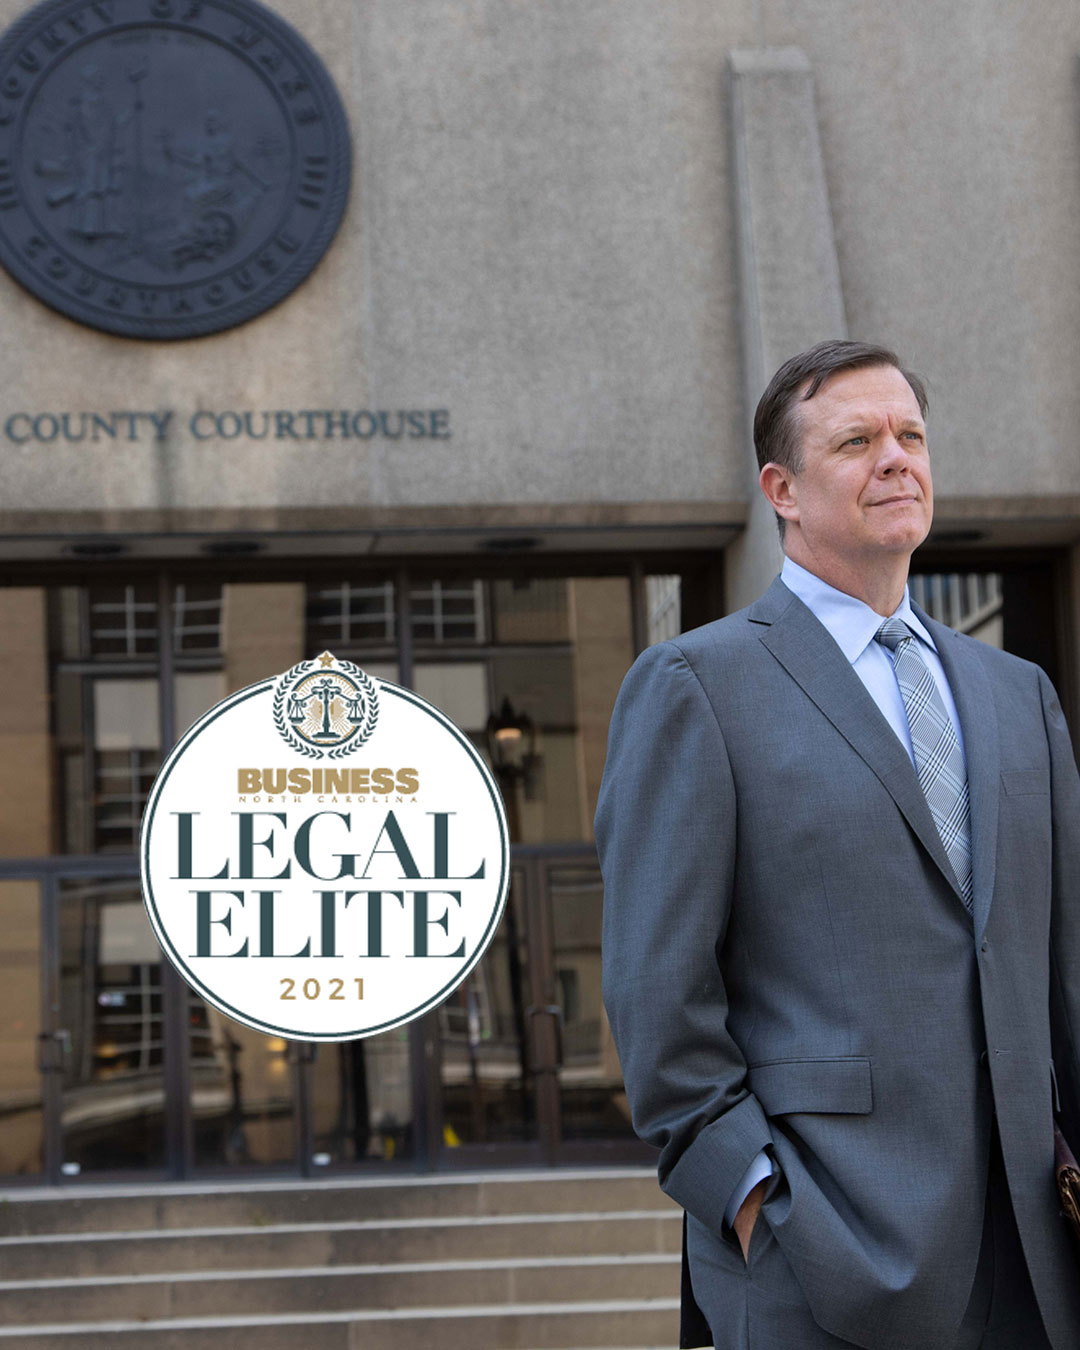 RDeMent2021-Legal-Elite-noHeadings1